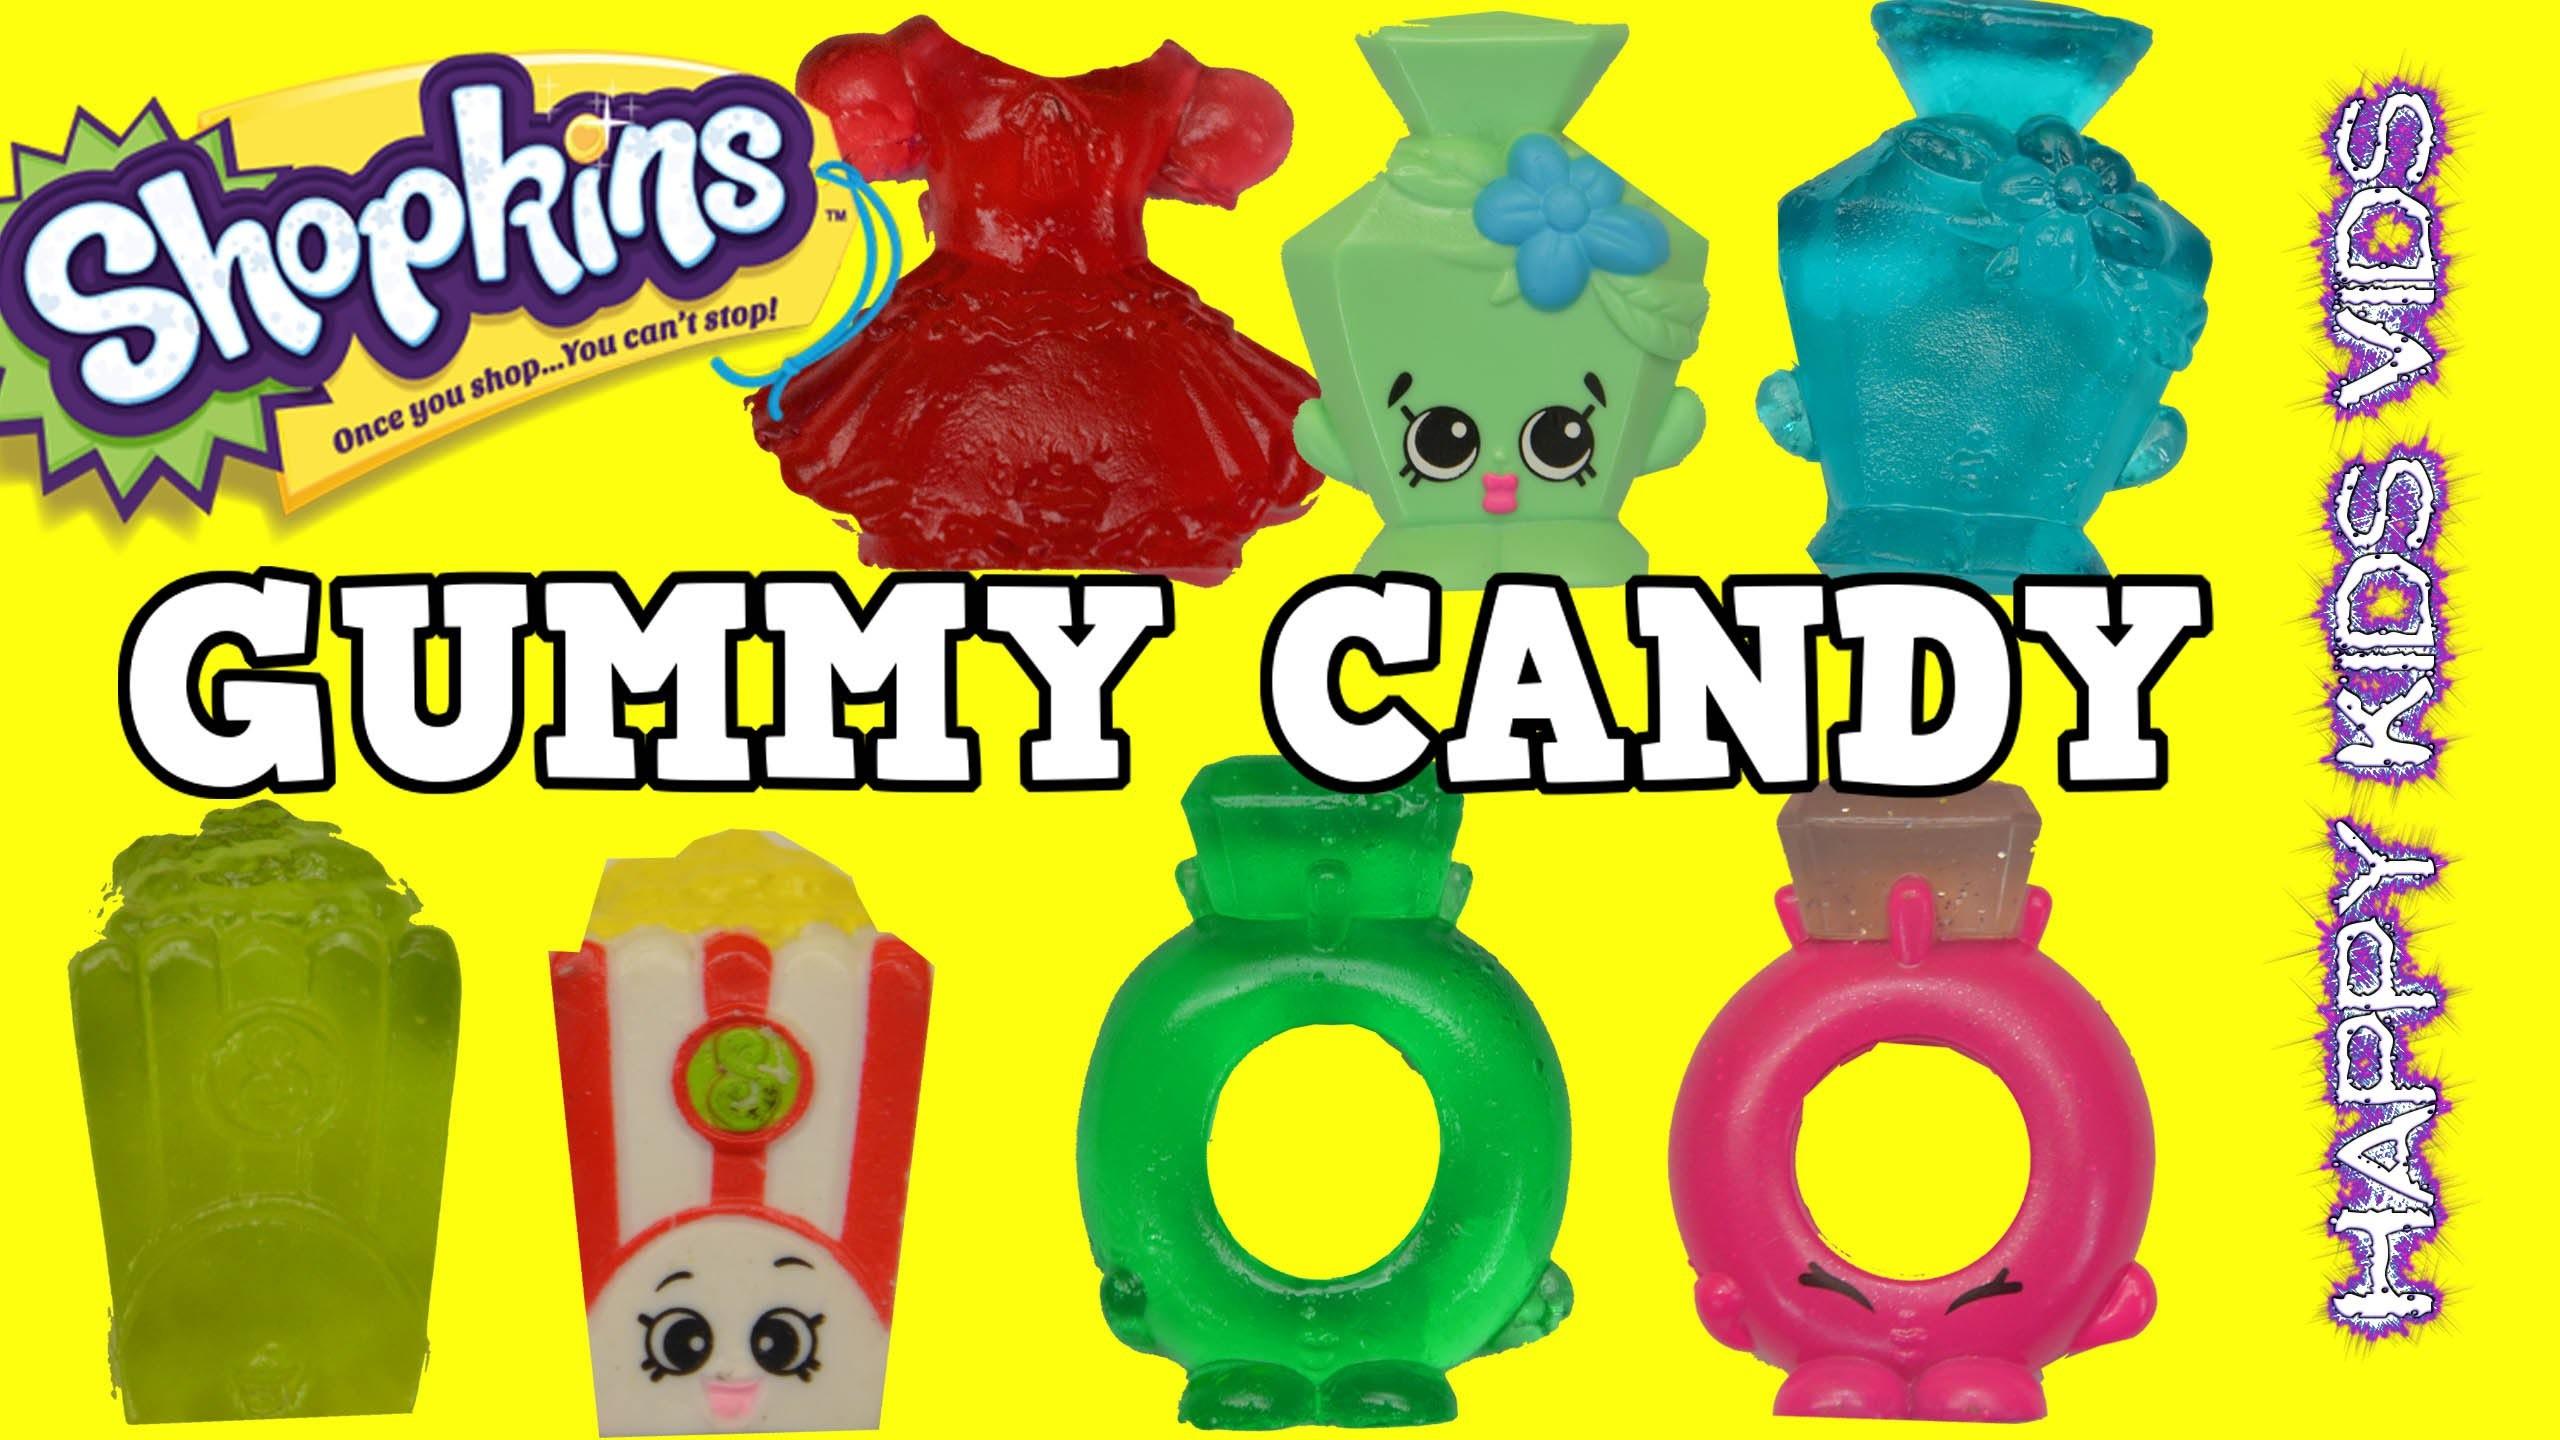 MAKE YOUR OWN SHOPKINS GUMMY Candy DIY